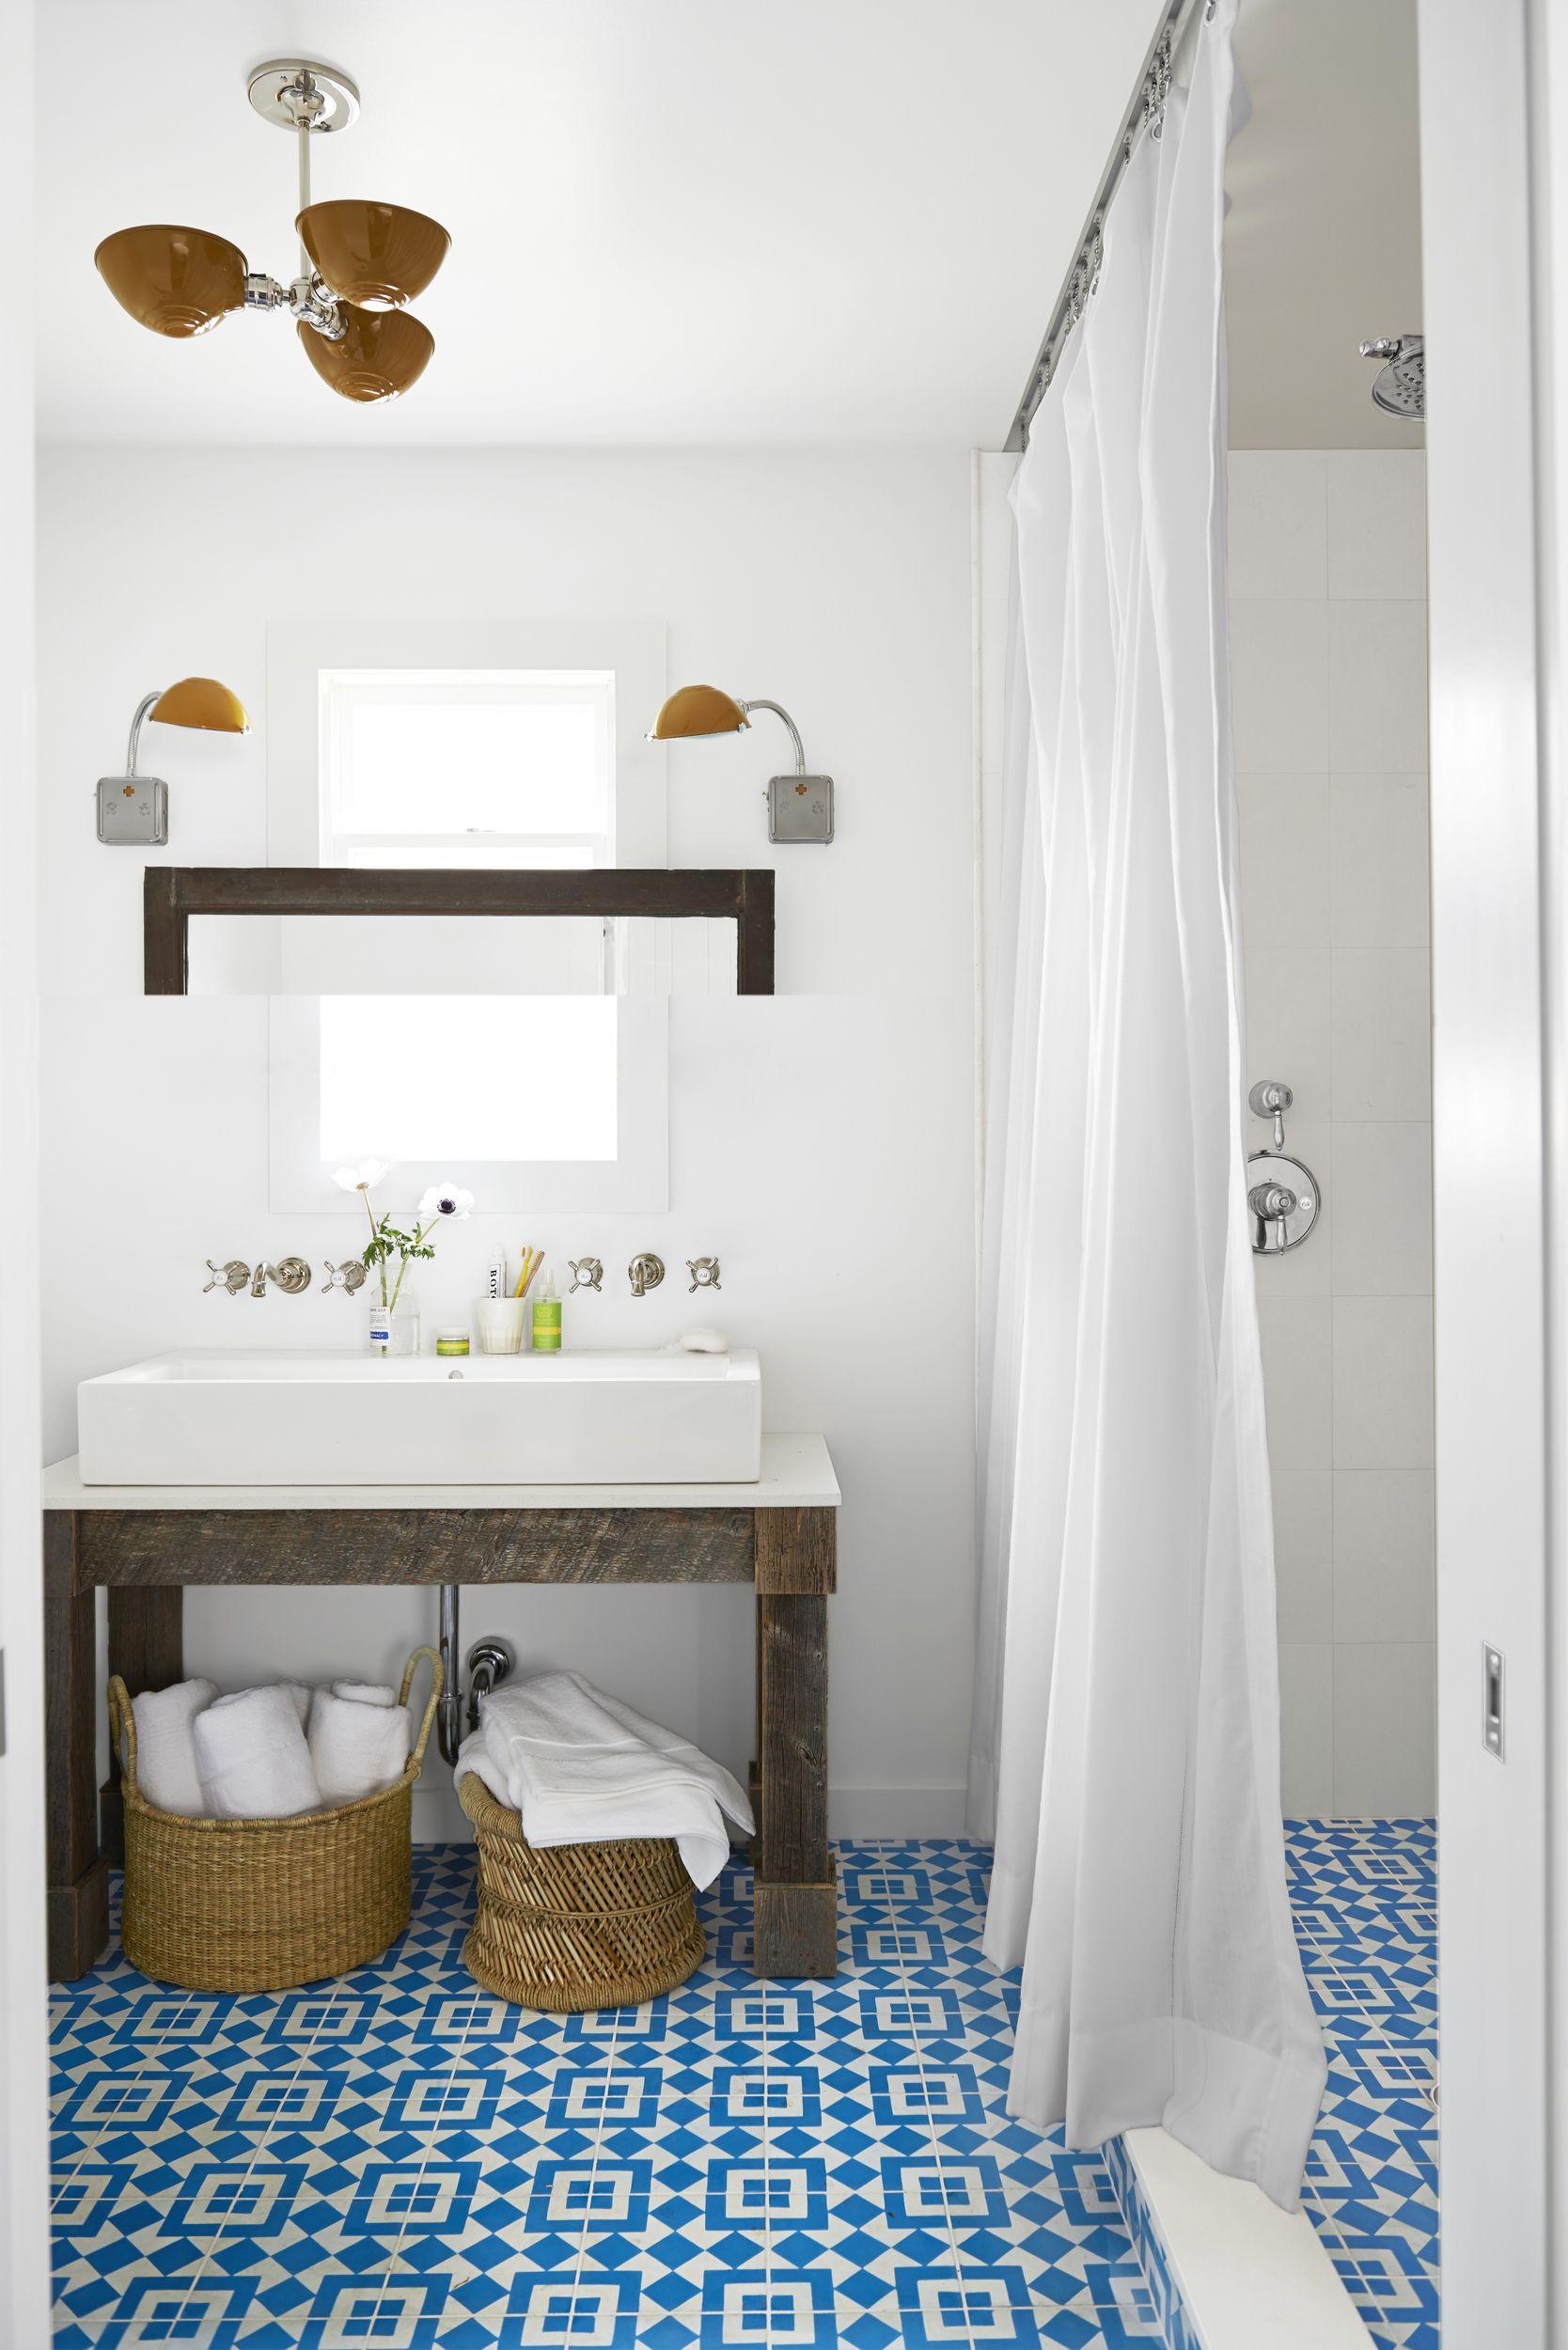 Small Bathroom Storage Unique Ideas For Spaces S69 - Iqrleads.co